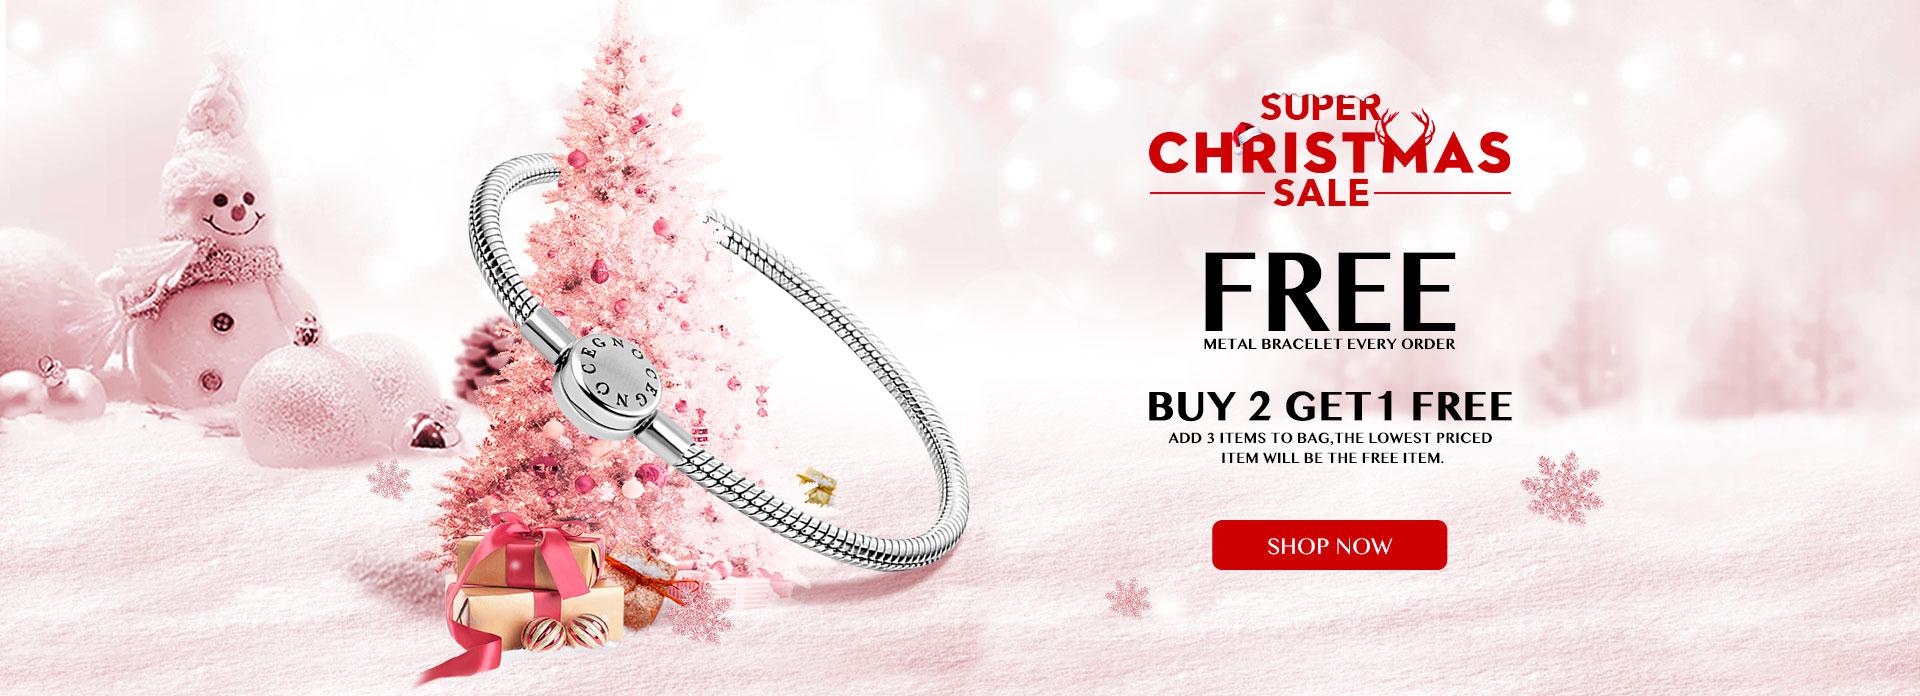 Super Christmas Sale